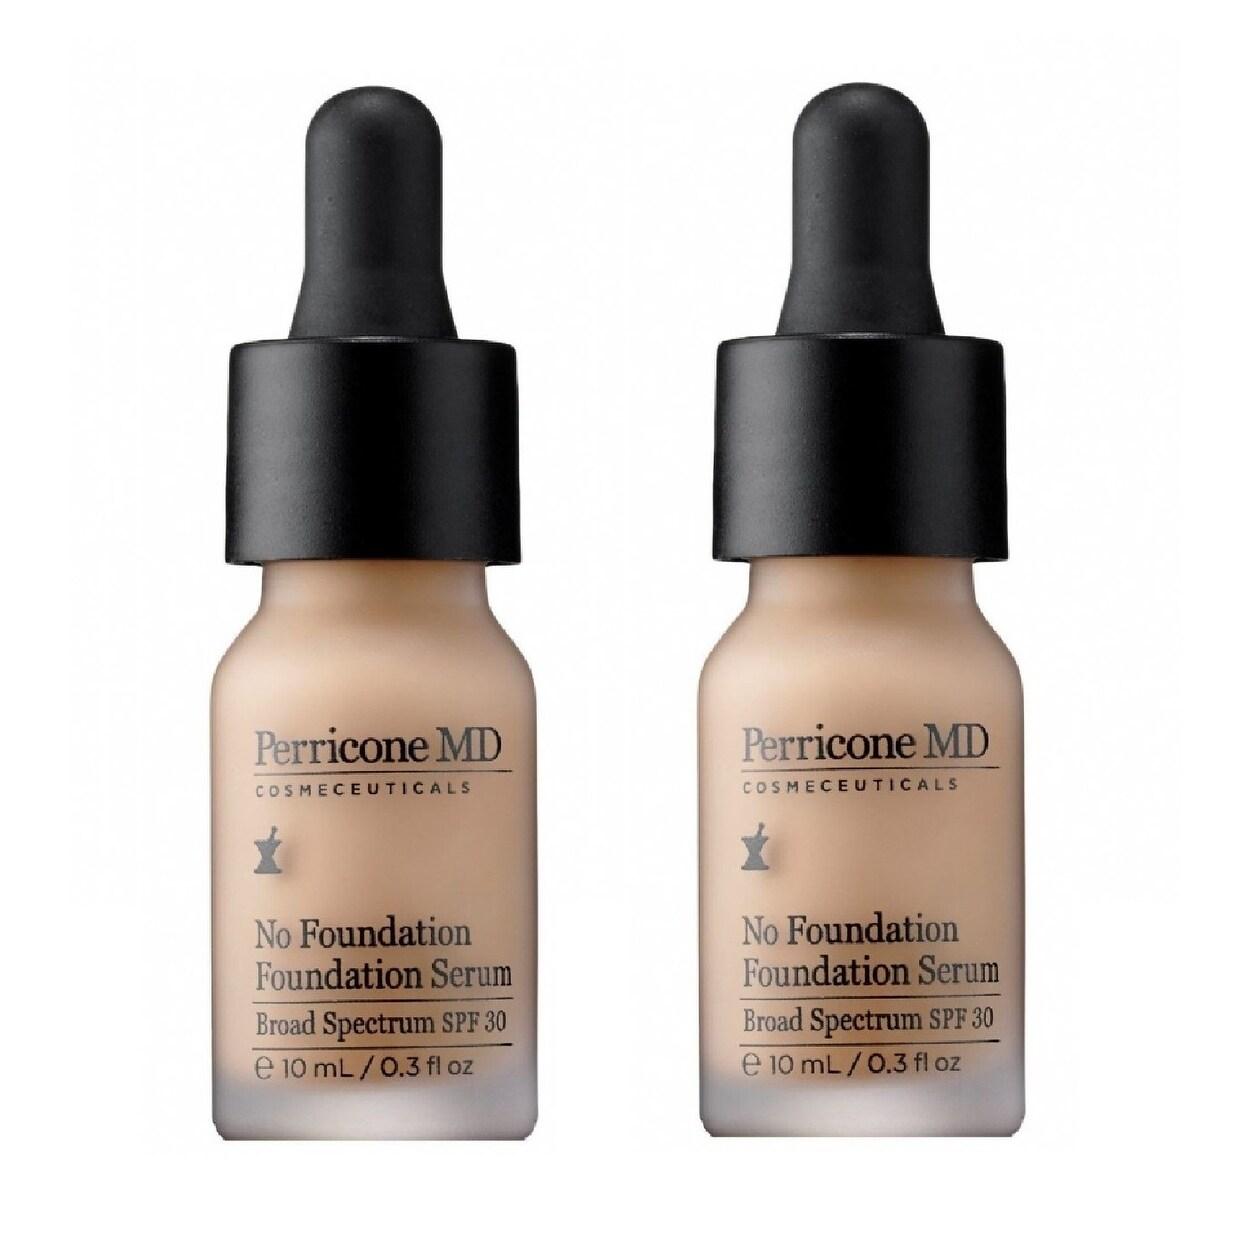 Perricone md foundation serum